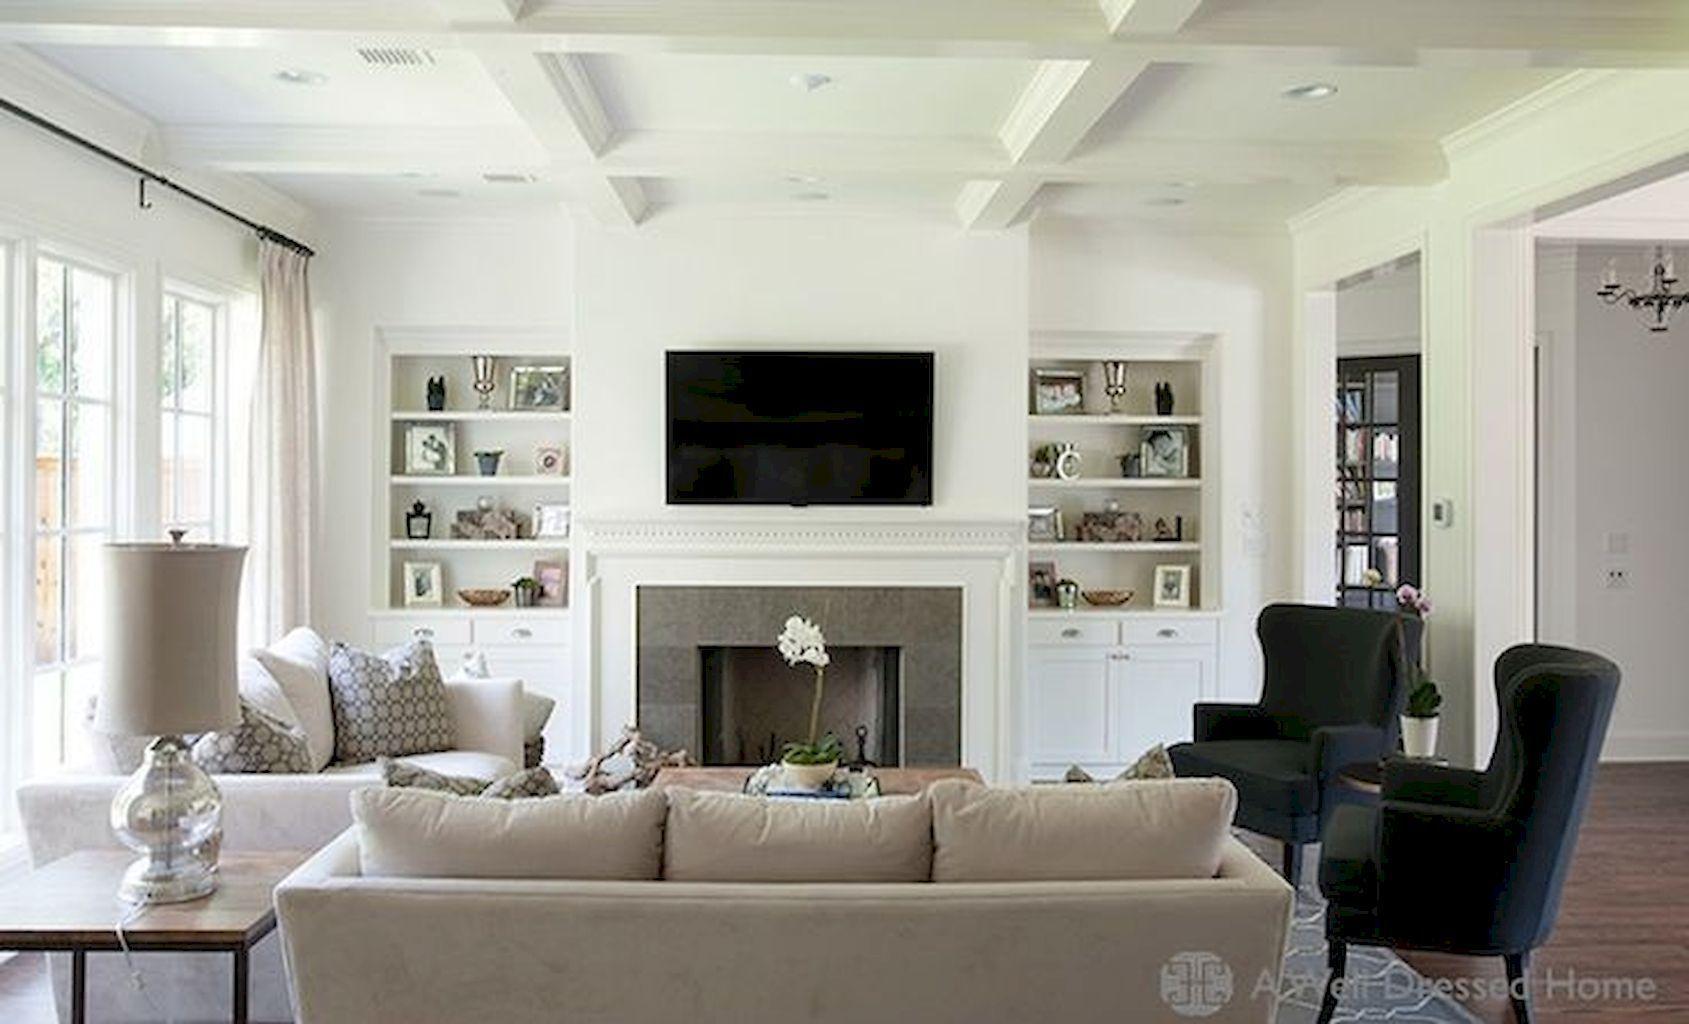 75 warm and cozy farmhouse style living room decor ideas (45 ...